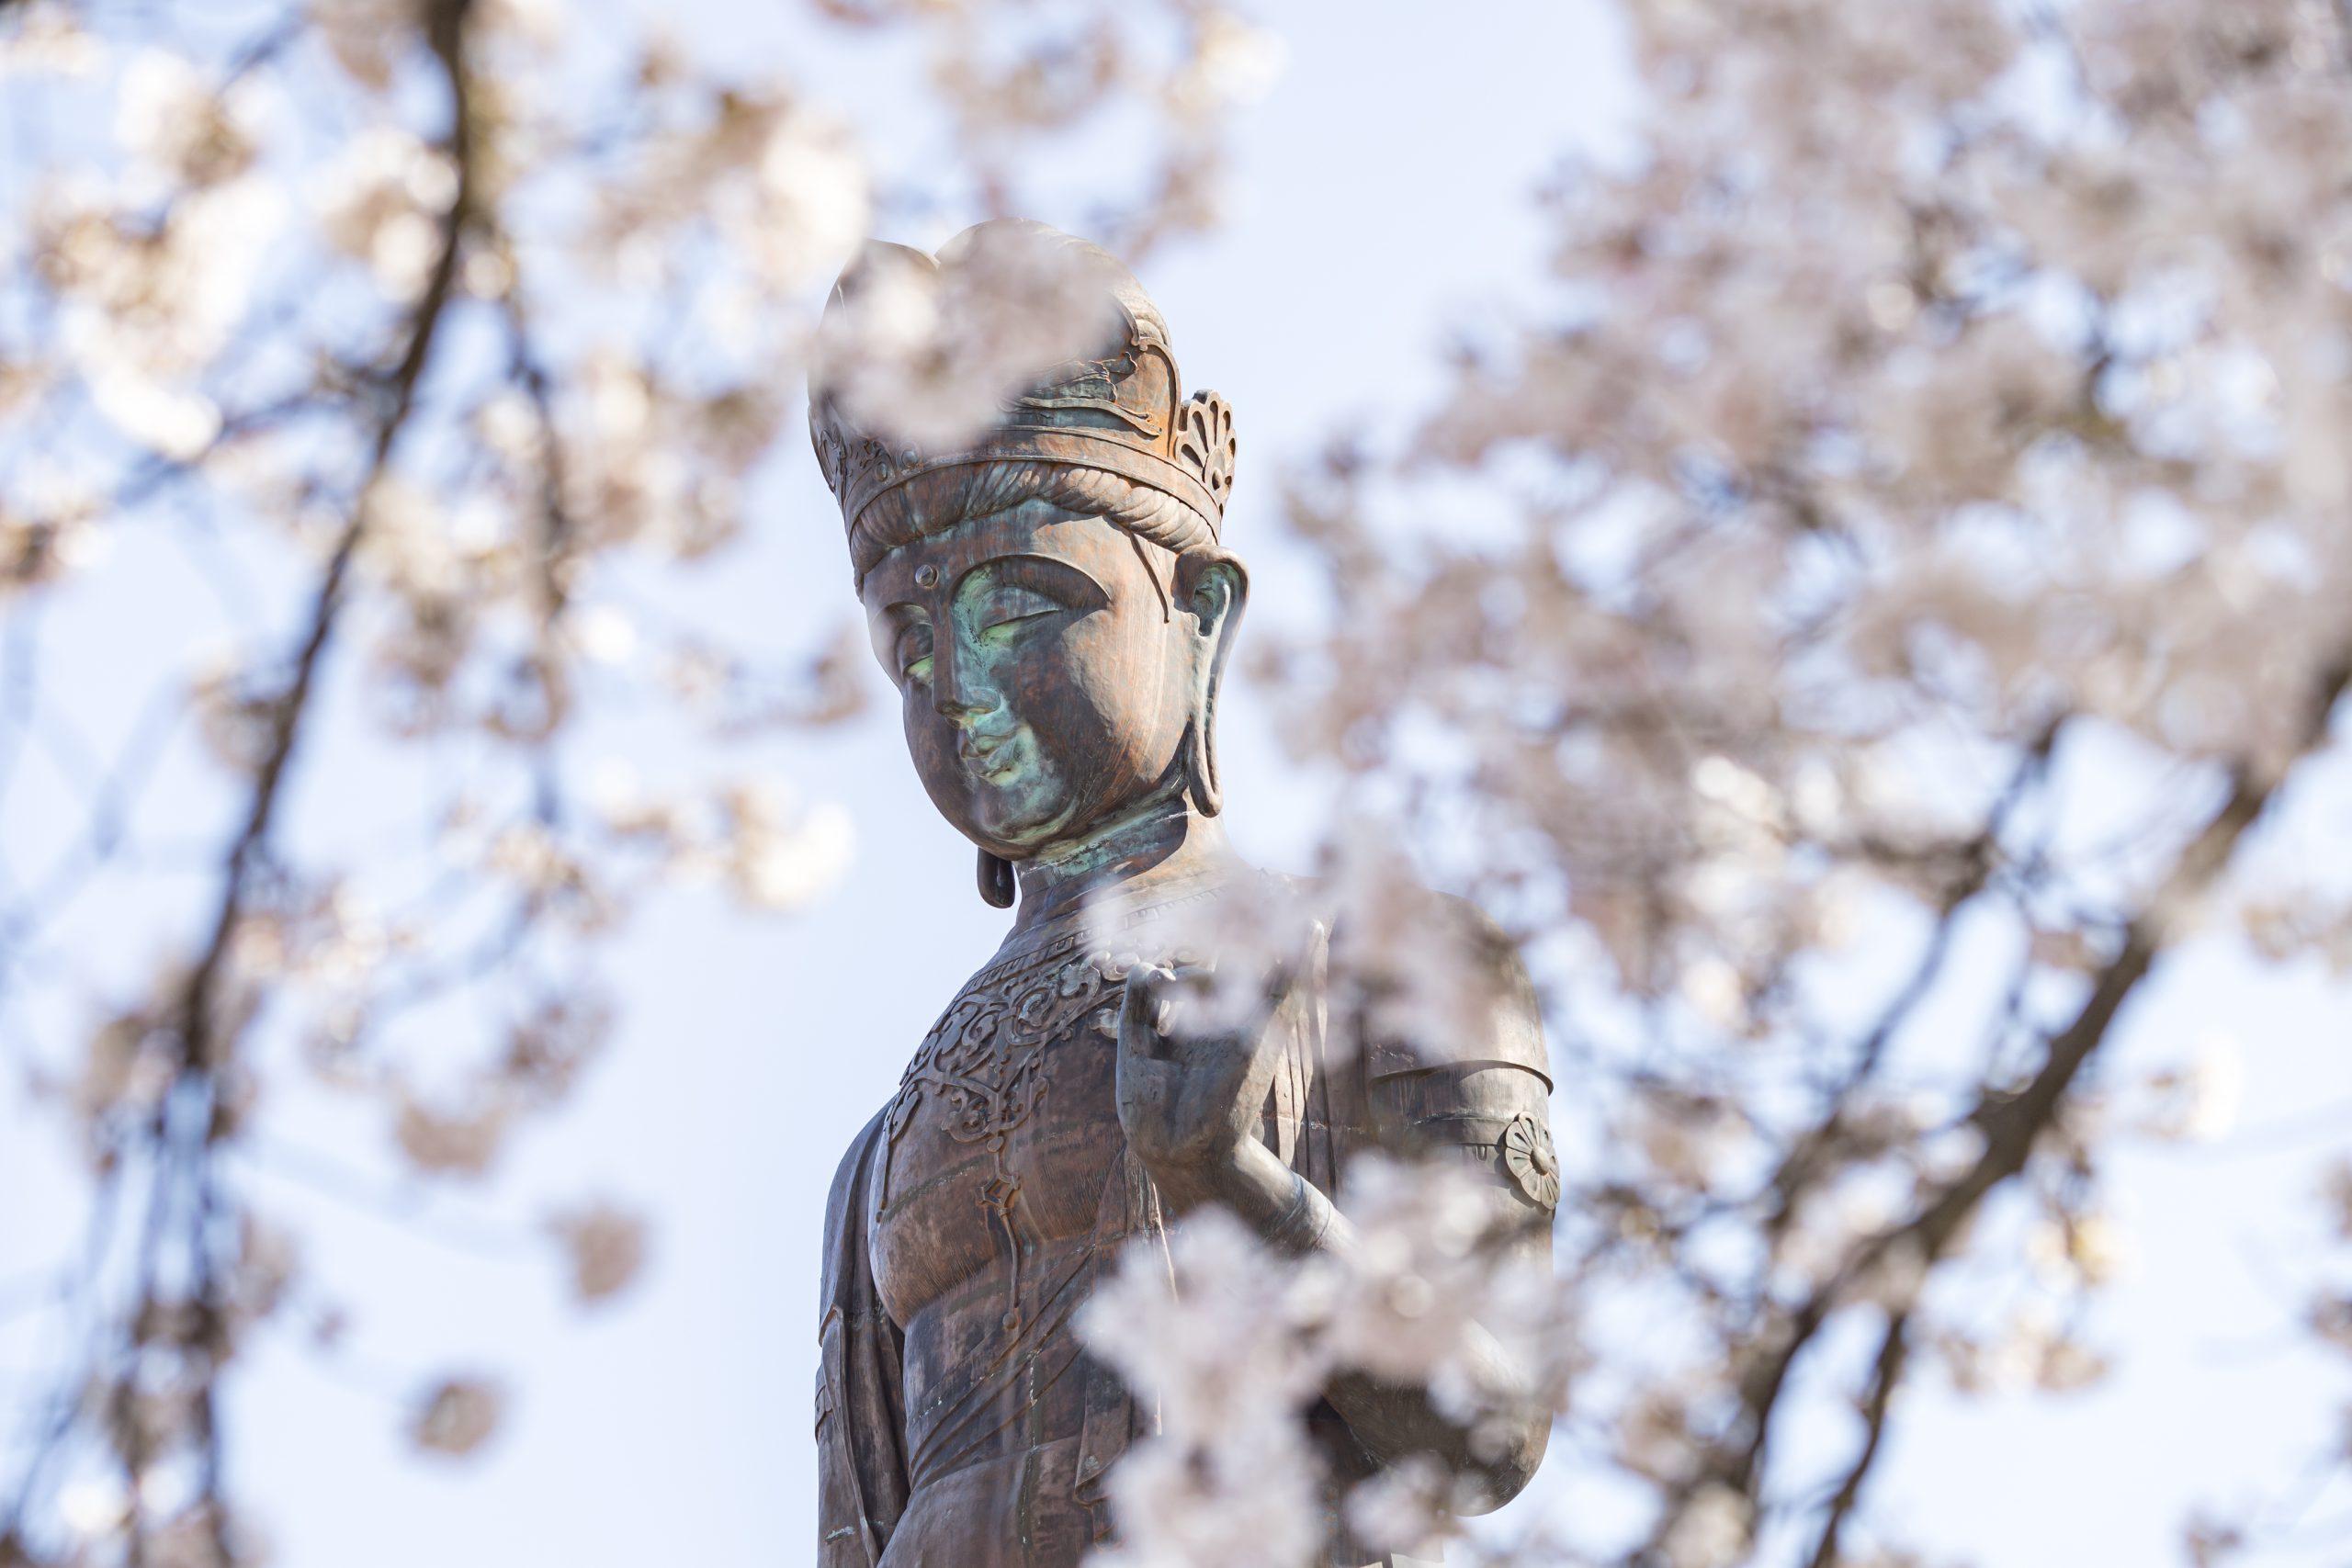 cherry-blossom-yudanaka-onsen-Sekai-Heiwa-Kannon-World-Peace-Buddha-Statu